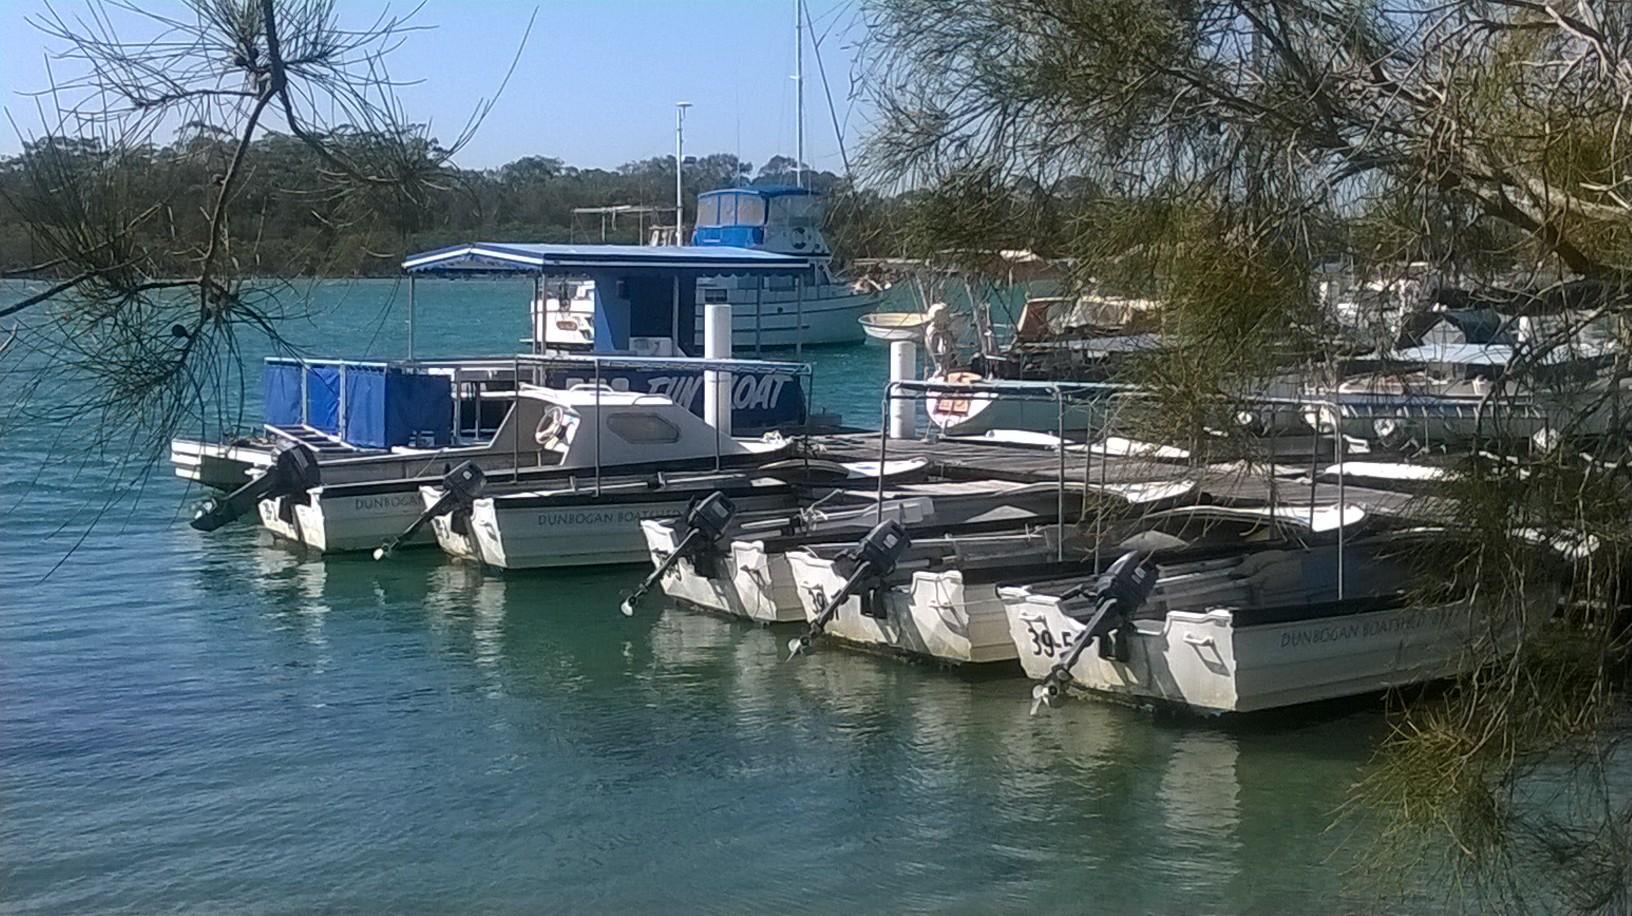 Hire boats Oct 2015